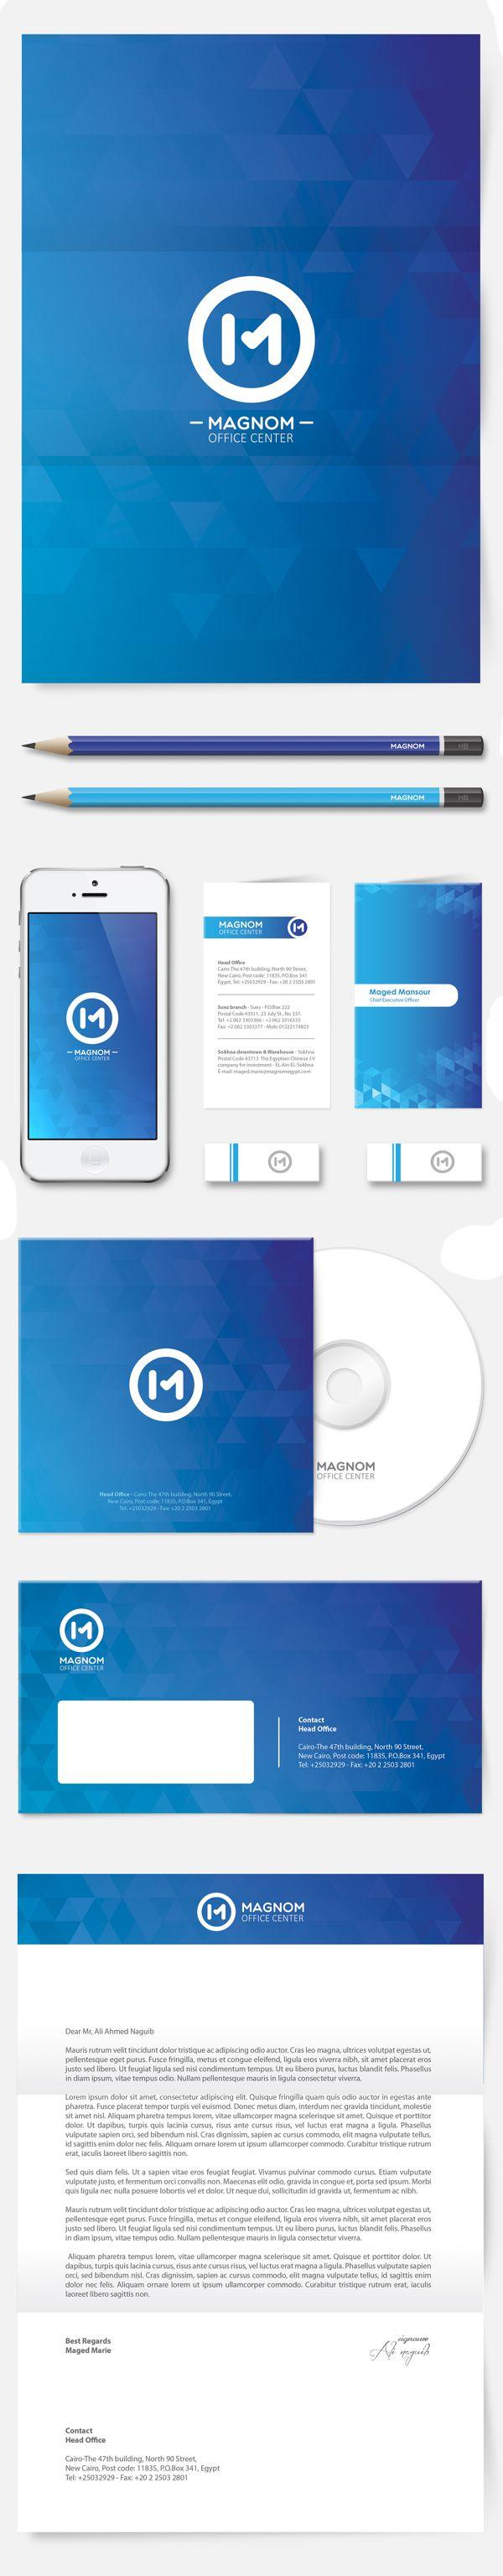 Magnom - Logo Guidelines & Branding identity by Ali Naguib, via Behance